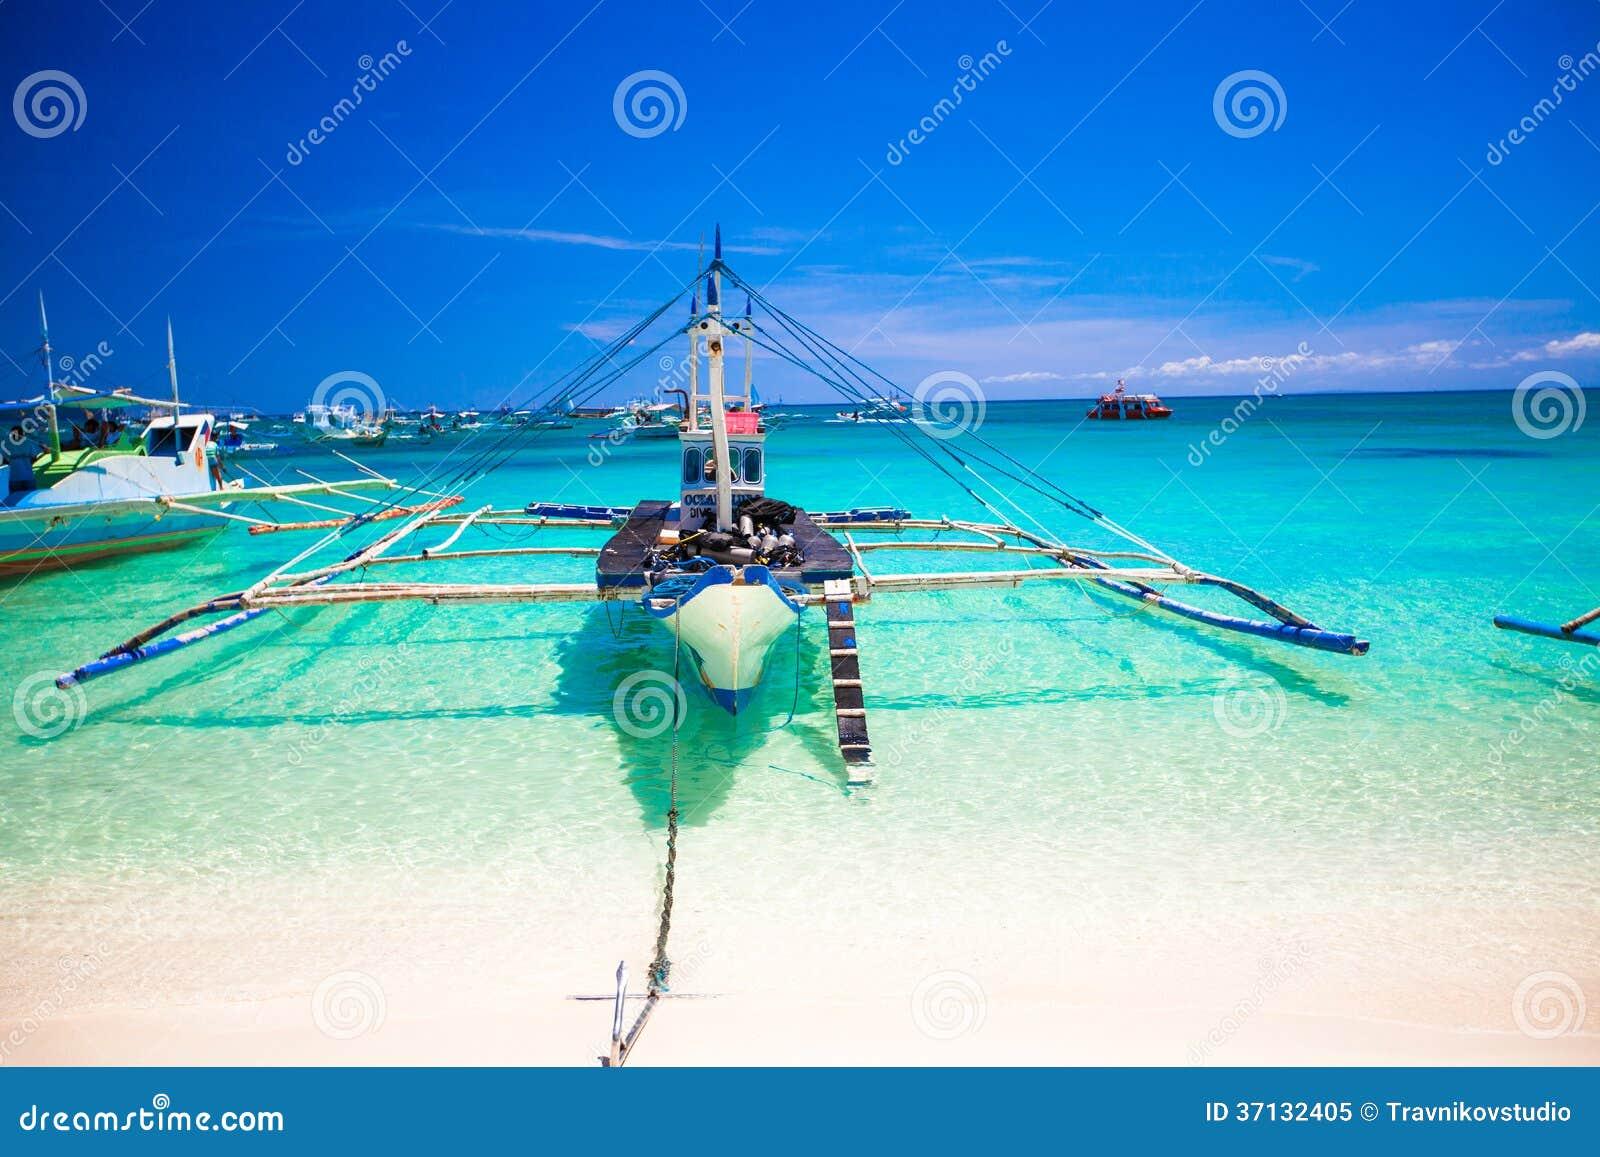 Barco filipino no mar de turquesa, Boracay,